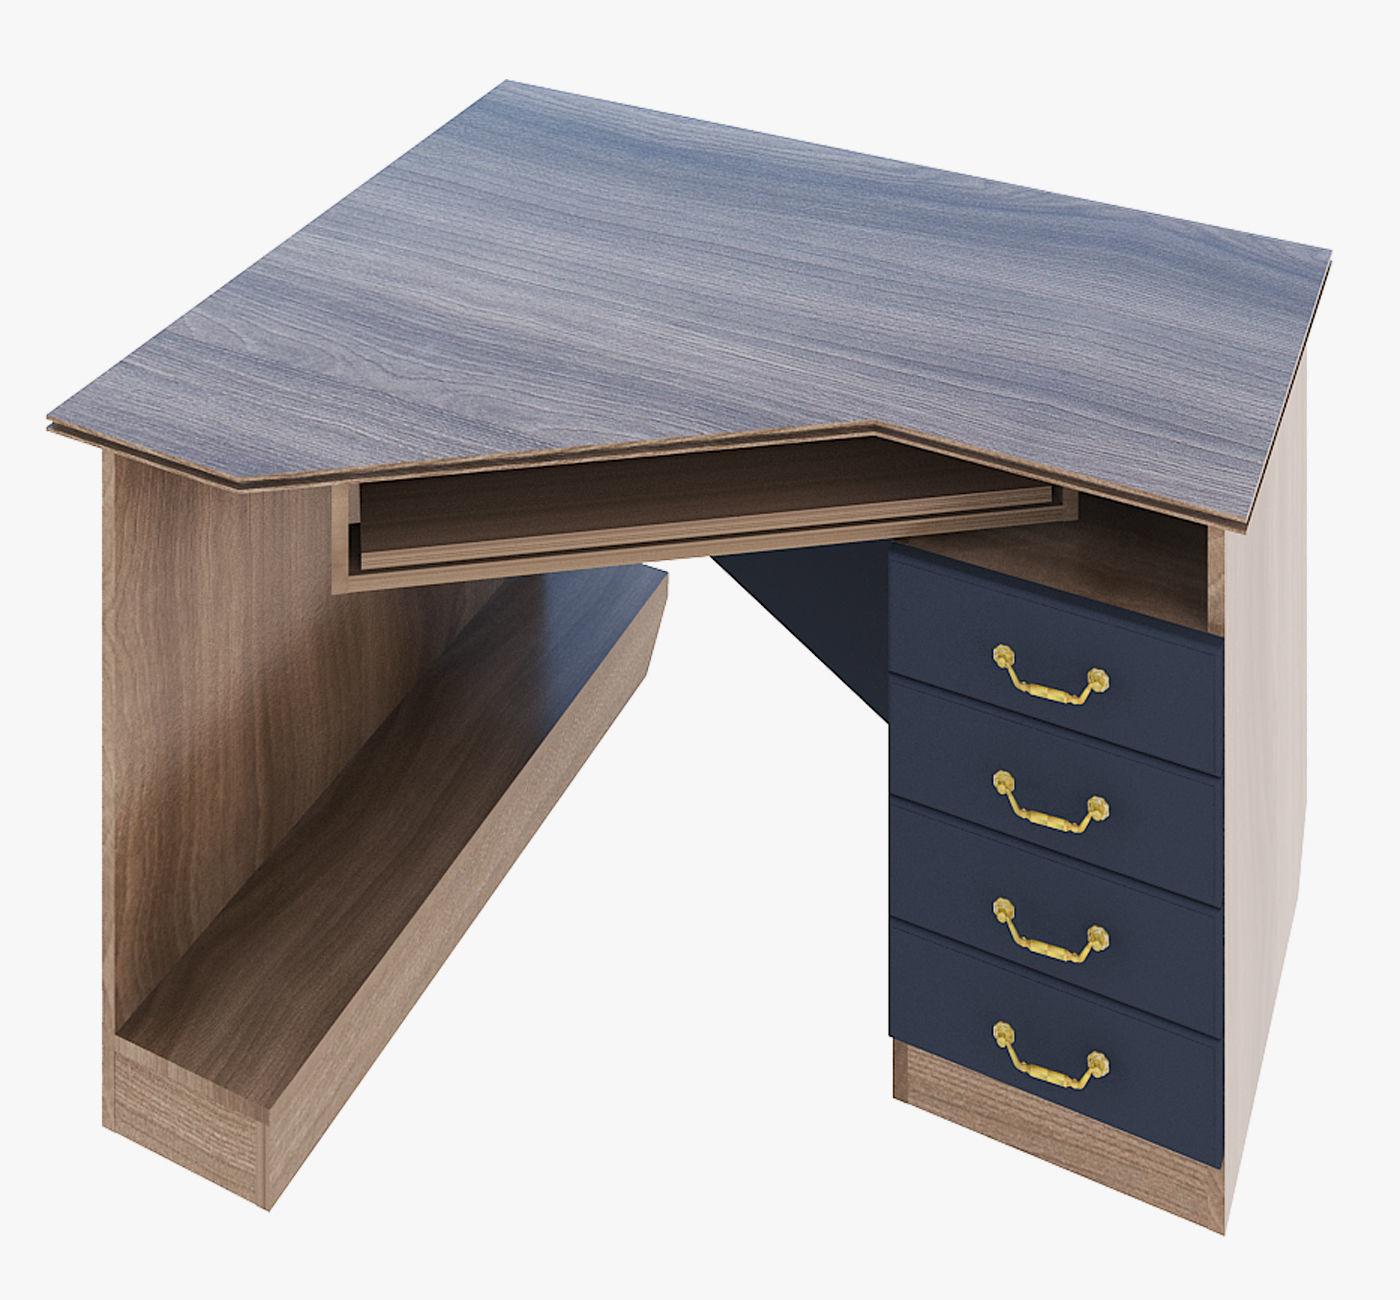 Furniture Computer Table  10D model